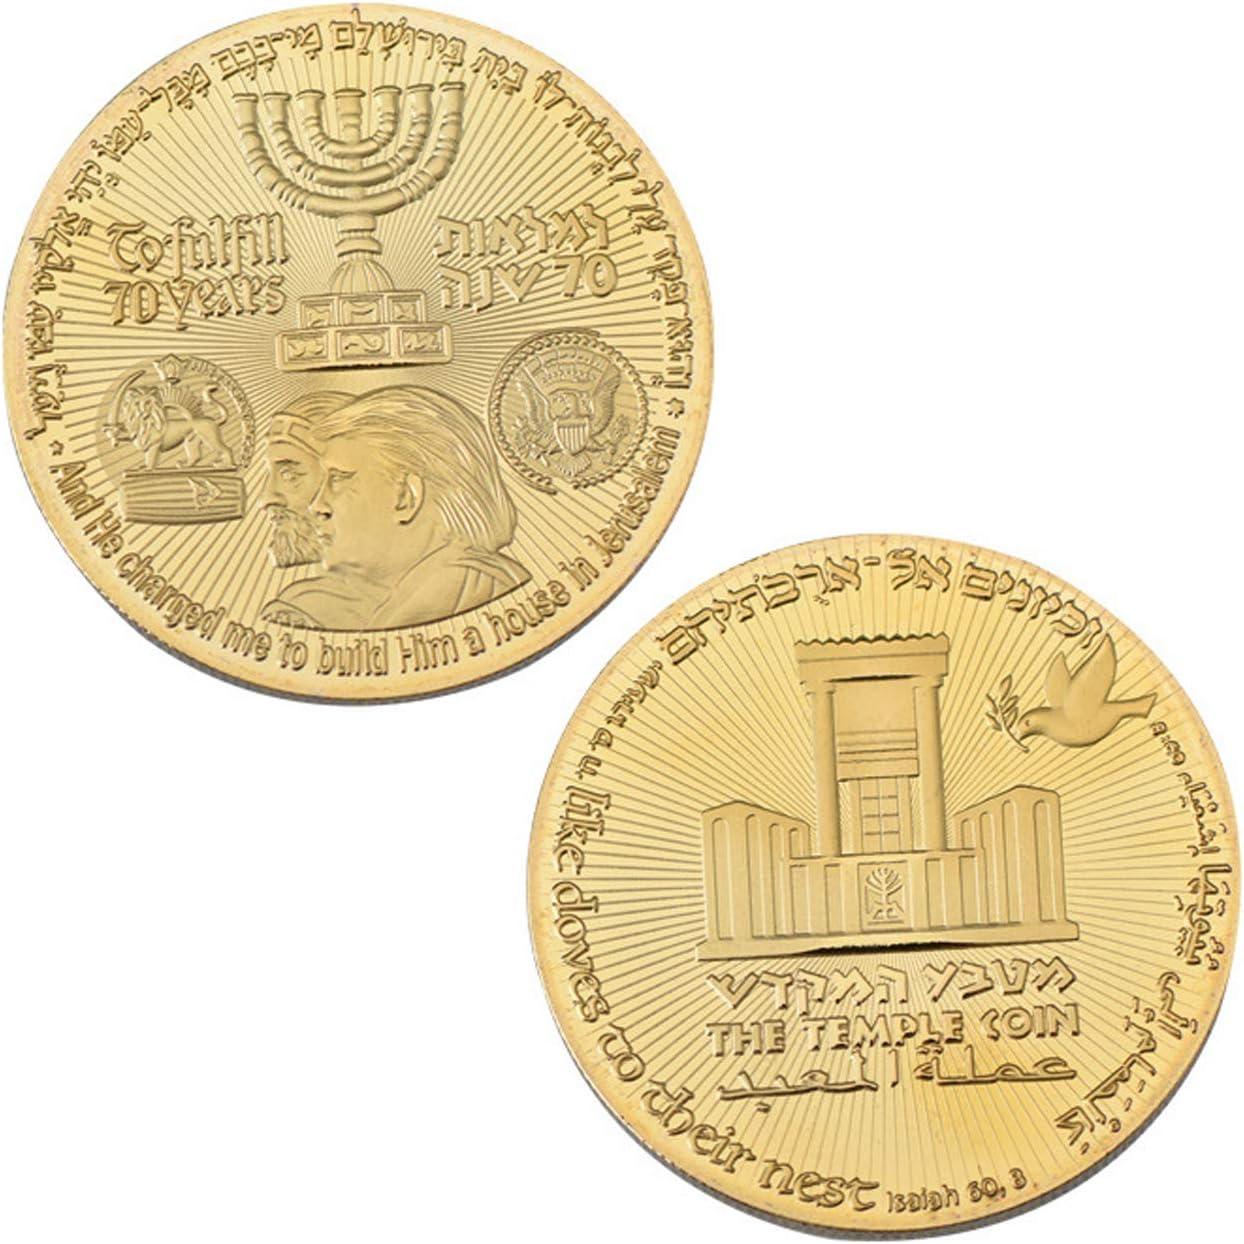 Donald Trump Gold Coin Max 84% OFF Jewish Temple USA Low price Israel 70th A Jerusalem